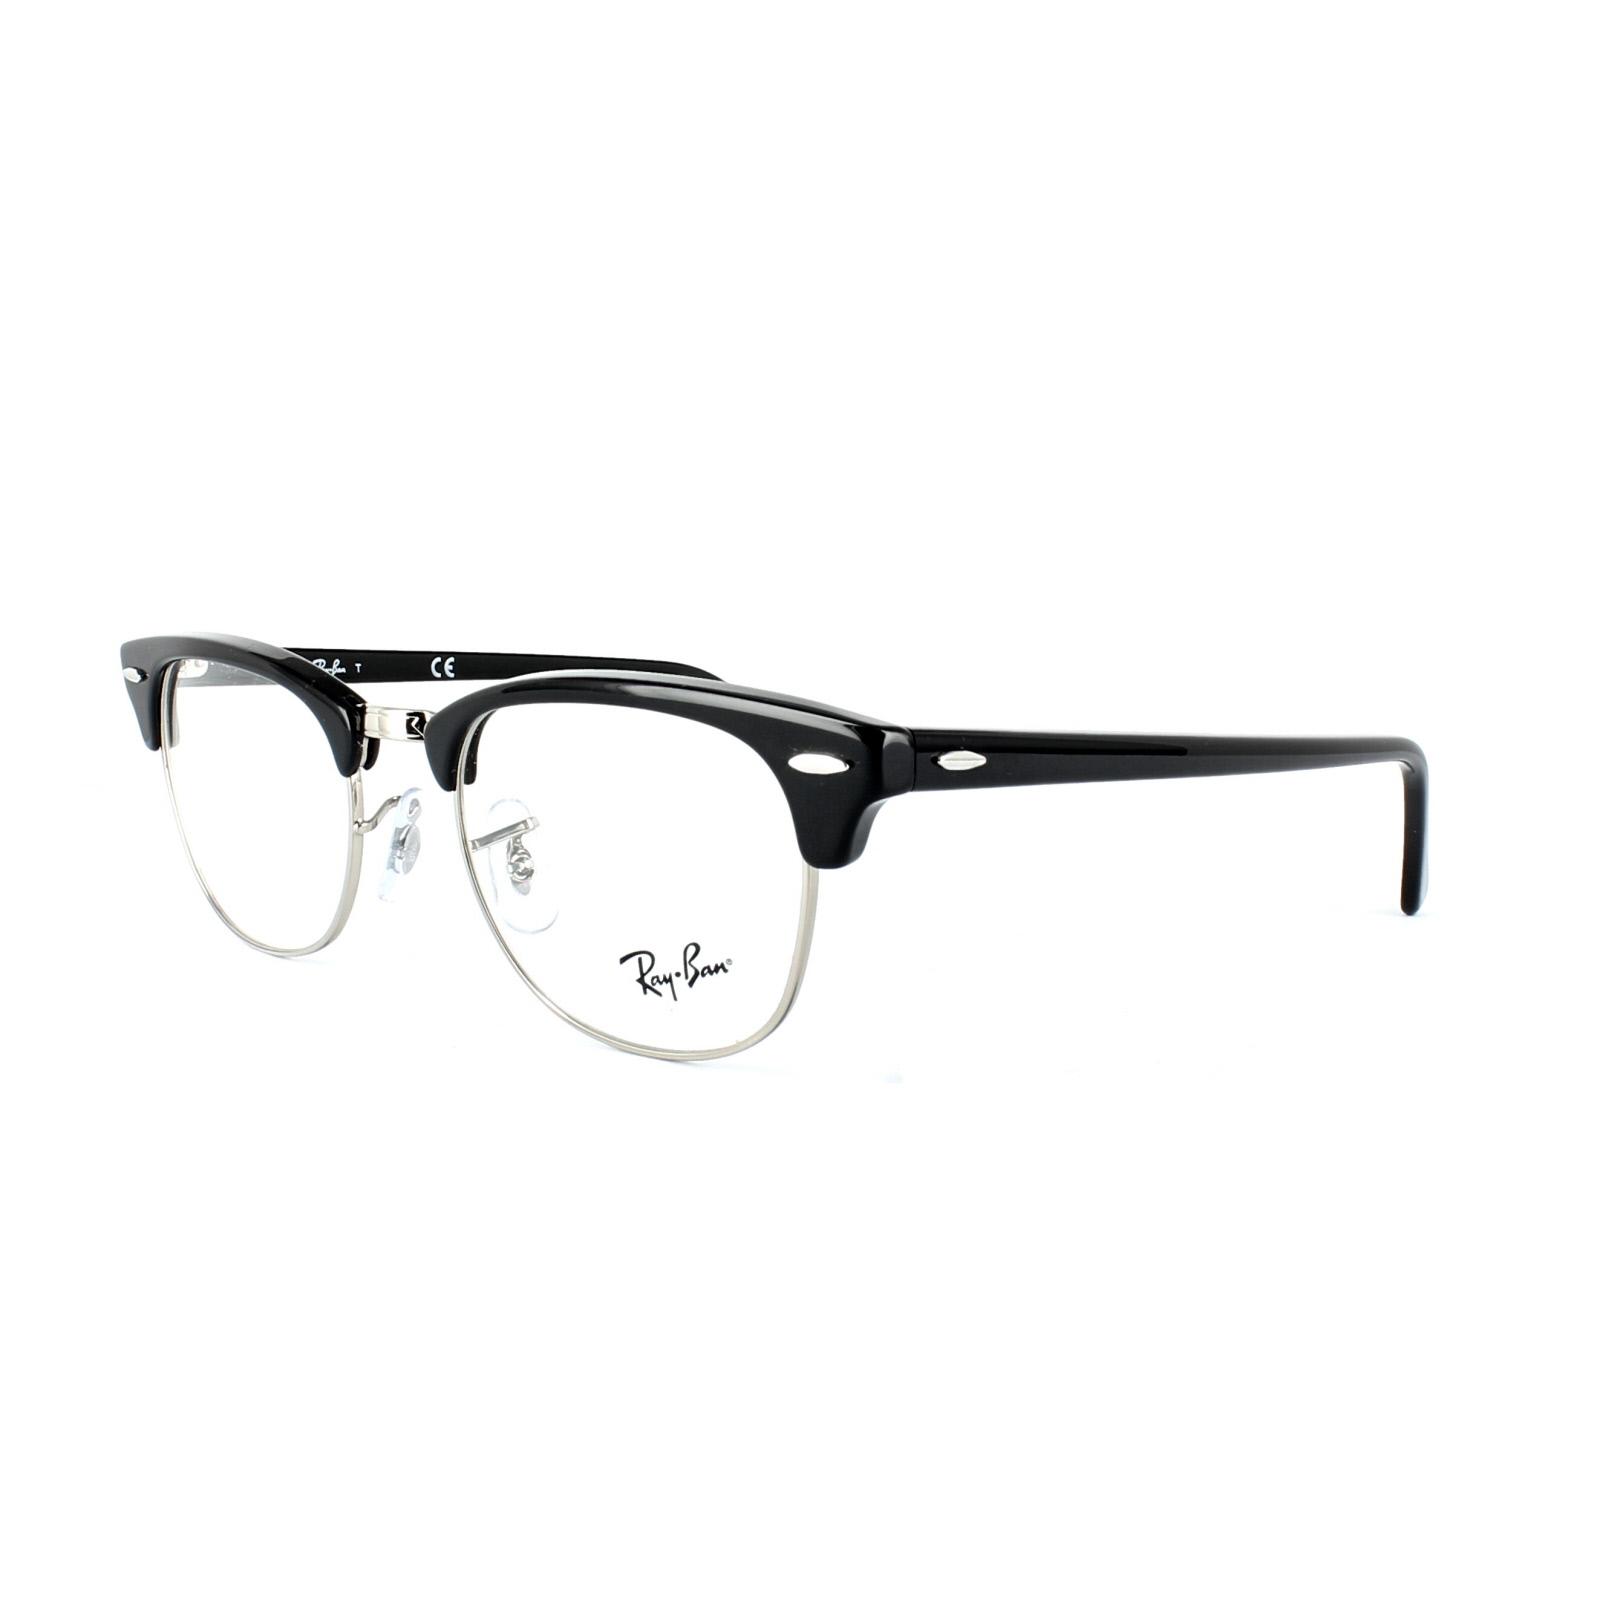 ray ban brillengestell 5154 clubmaster 2000 shiny black ebay. Black Bedroom Furniture Sets. Home Design Ideas